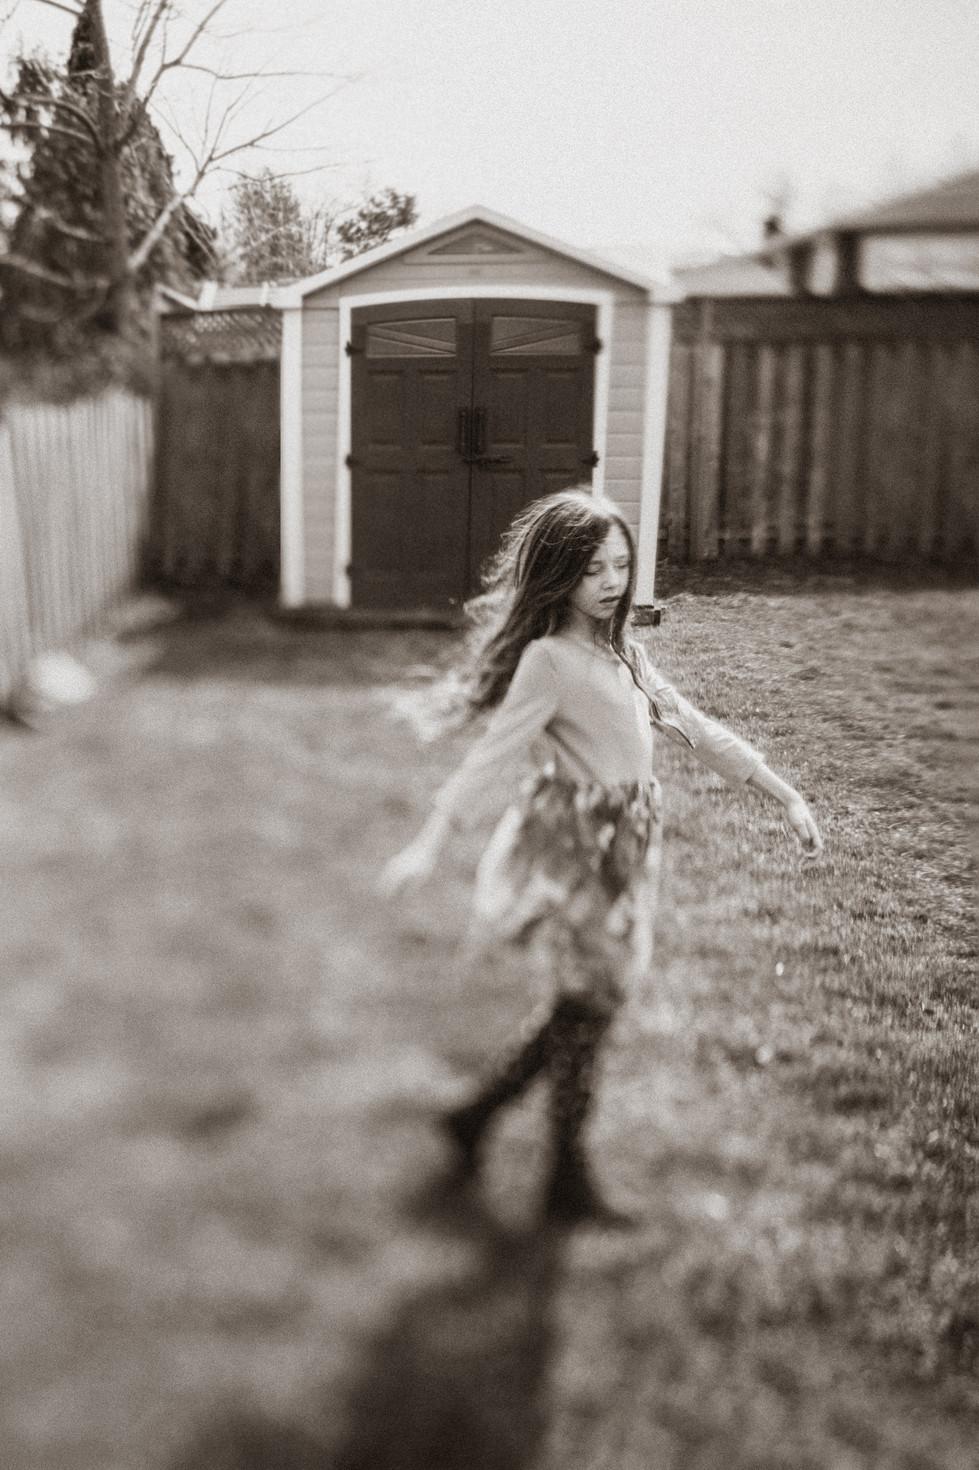 Hollie_Jeakins_Photographer_Portraits.jpg